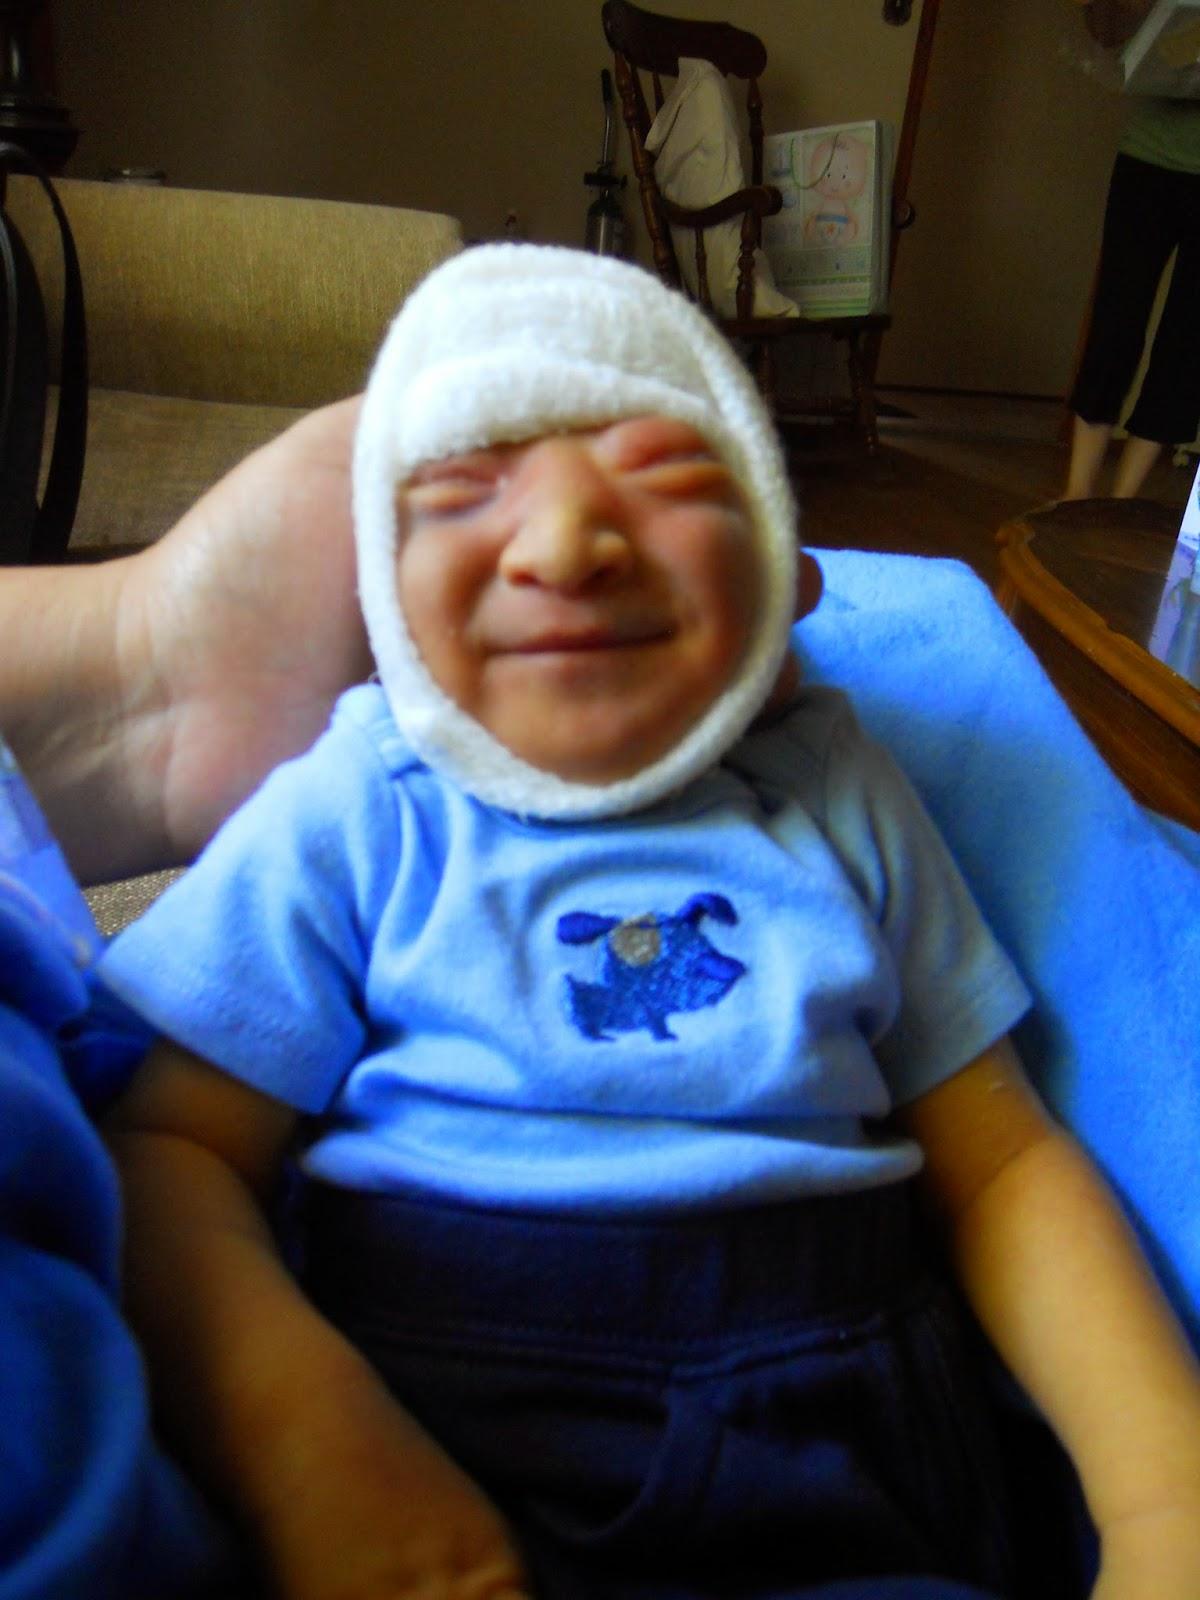 Ob/Gyn Updated : Anencephalic Newborn as an organ donor ...